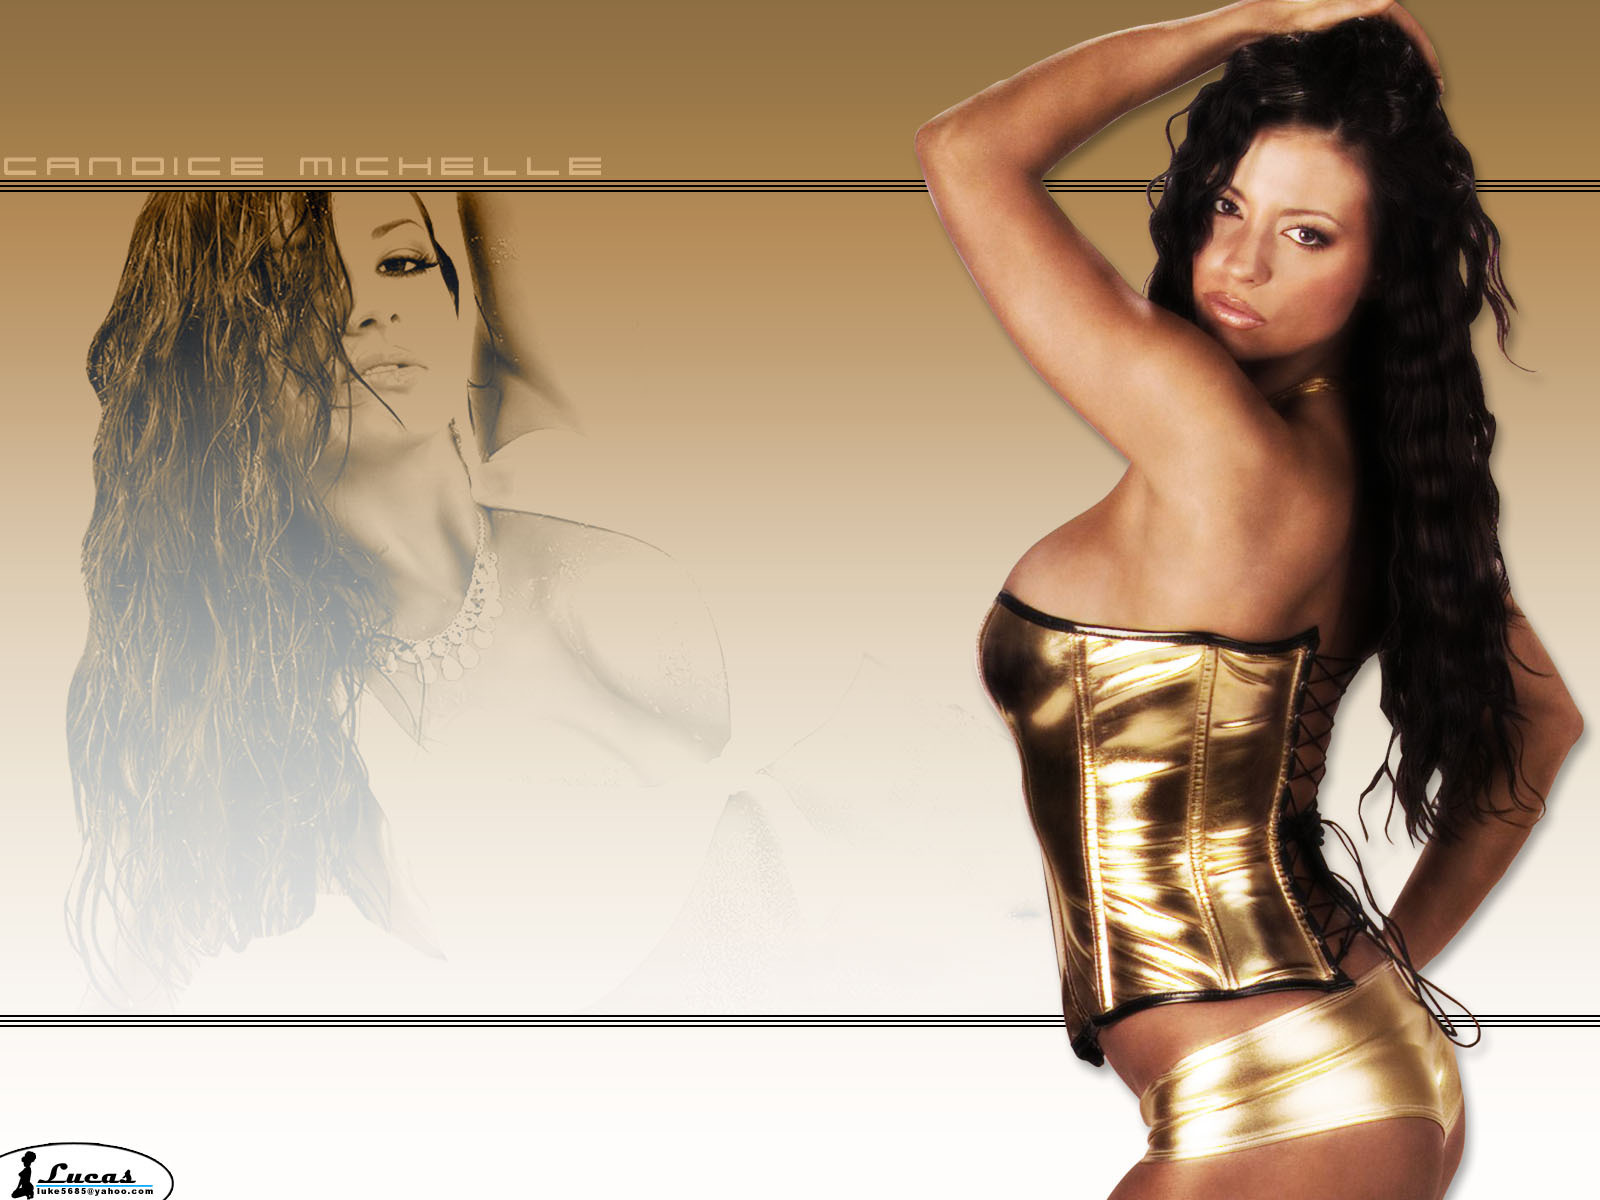 http://1.bp.blogspot.com/-Q01uauGQX0I/T5qBTV9CshI/AAAAAAAACpA/Wq7C5YUo9v4/s1600/candice_michelle_2012+wallpapers+06.jpg